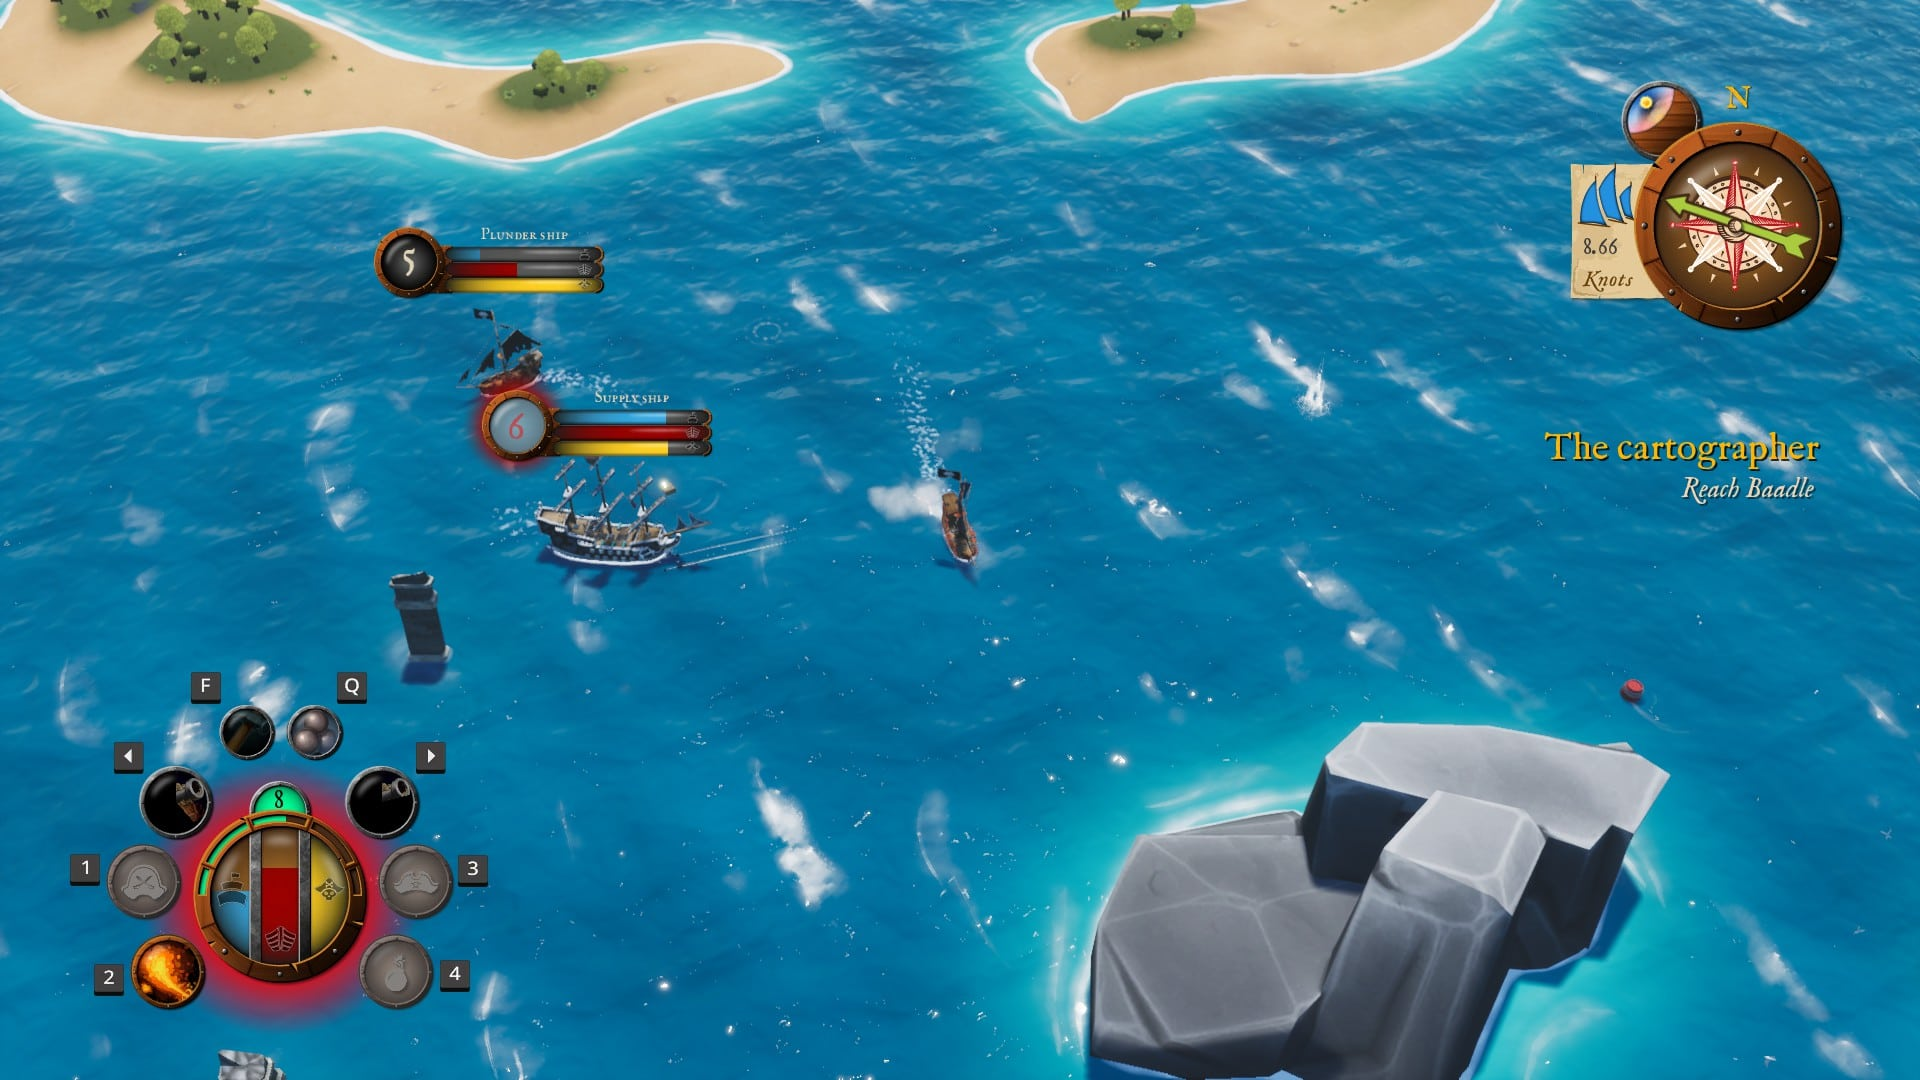 King of Seas - Gameplay